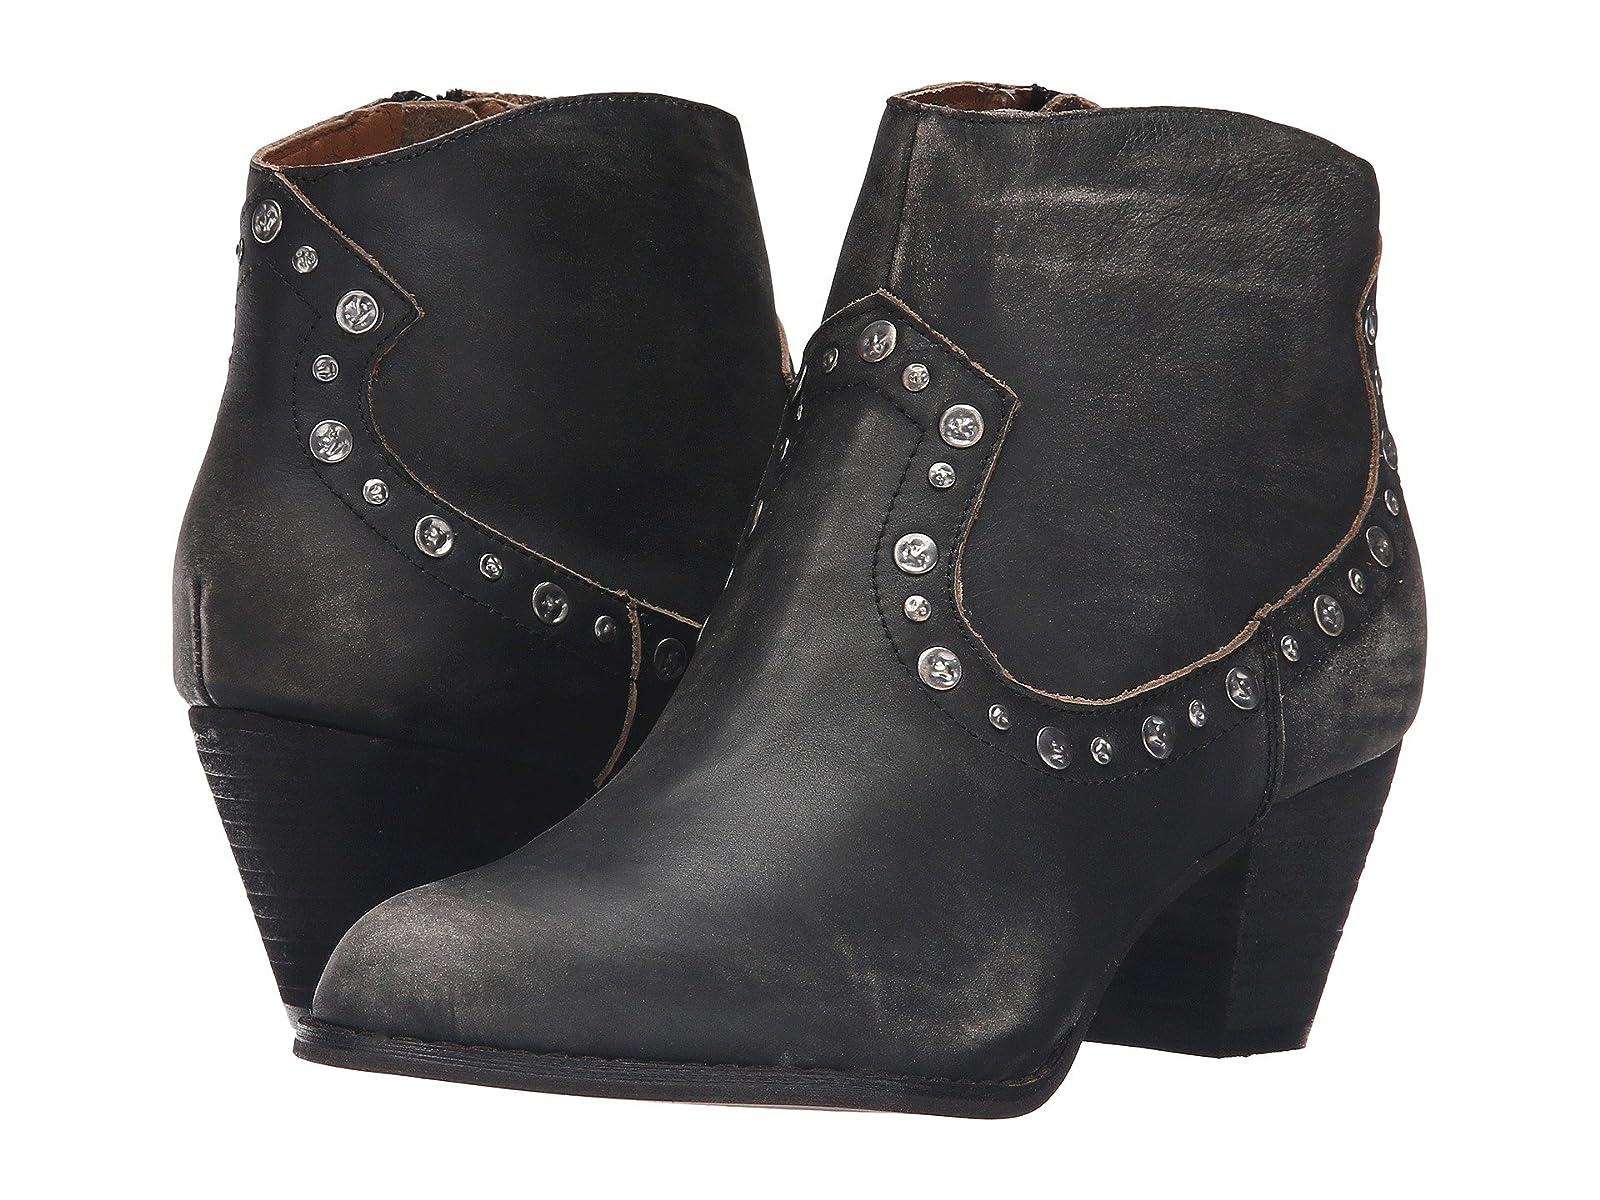 CC Corso Como BerkshireCheap and distinctive eye-catching shoes